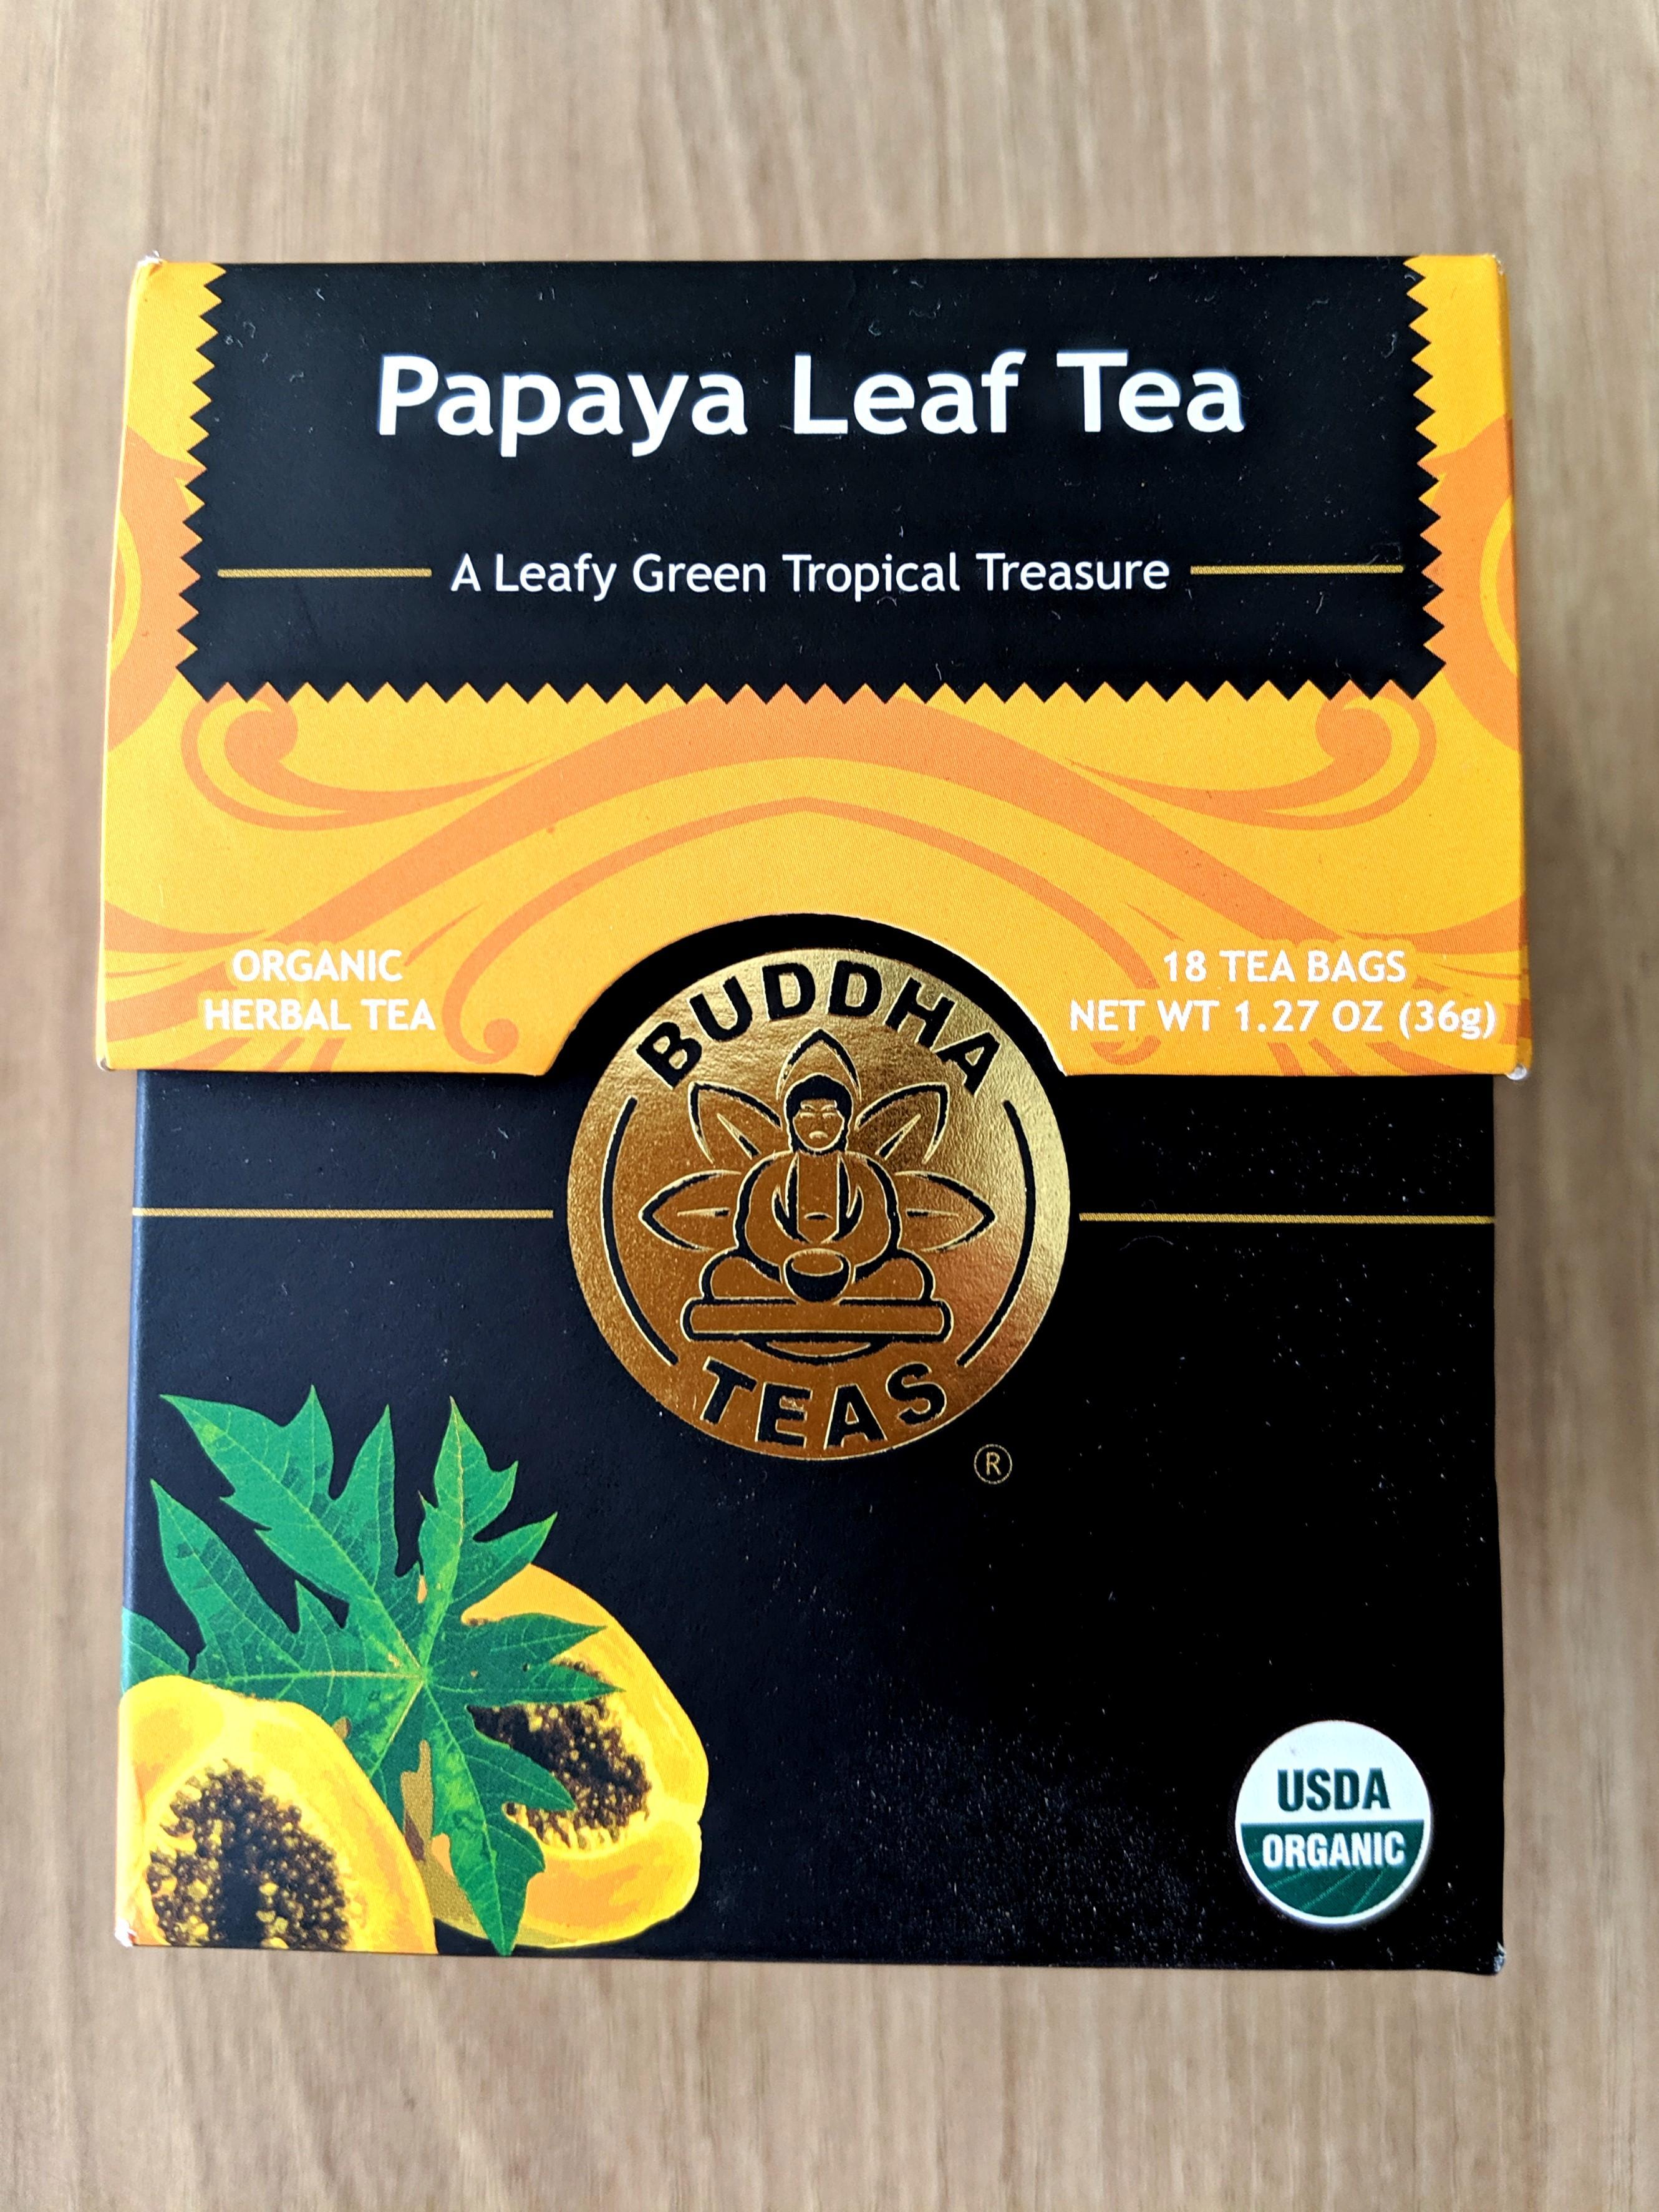 Papaya Leaf organic tea (from US)